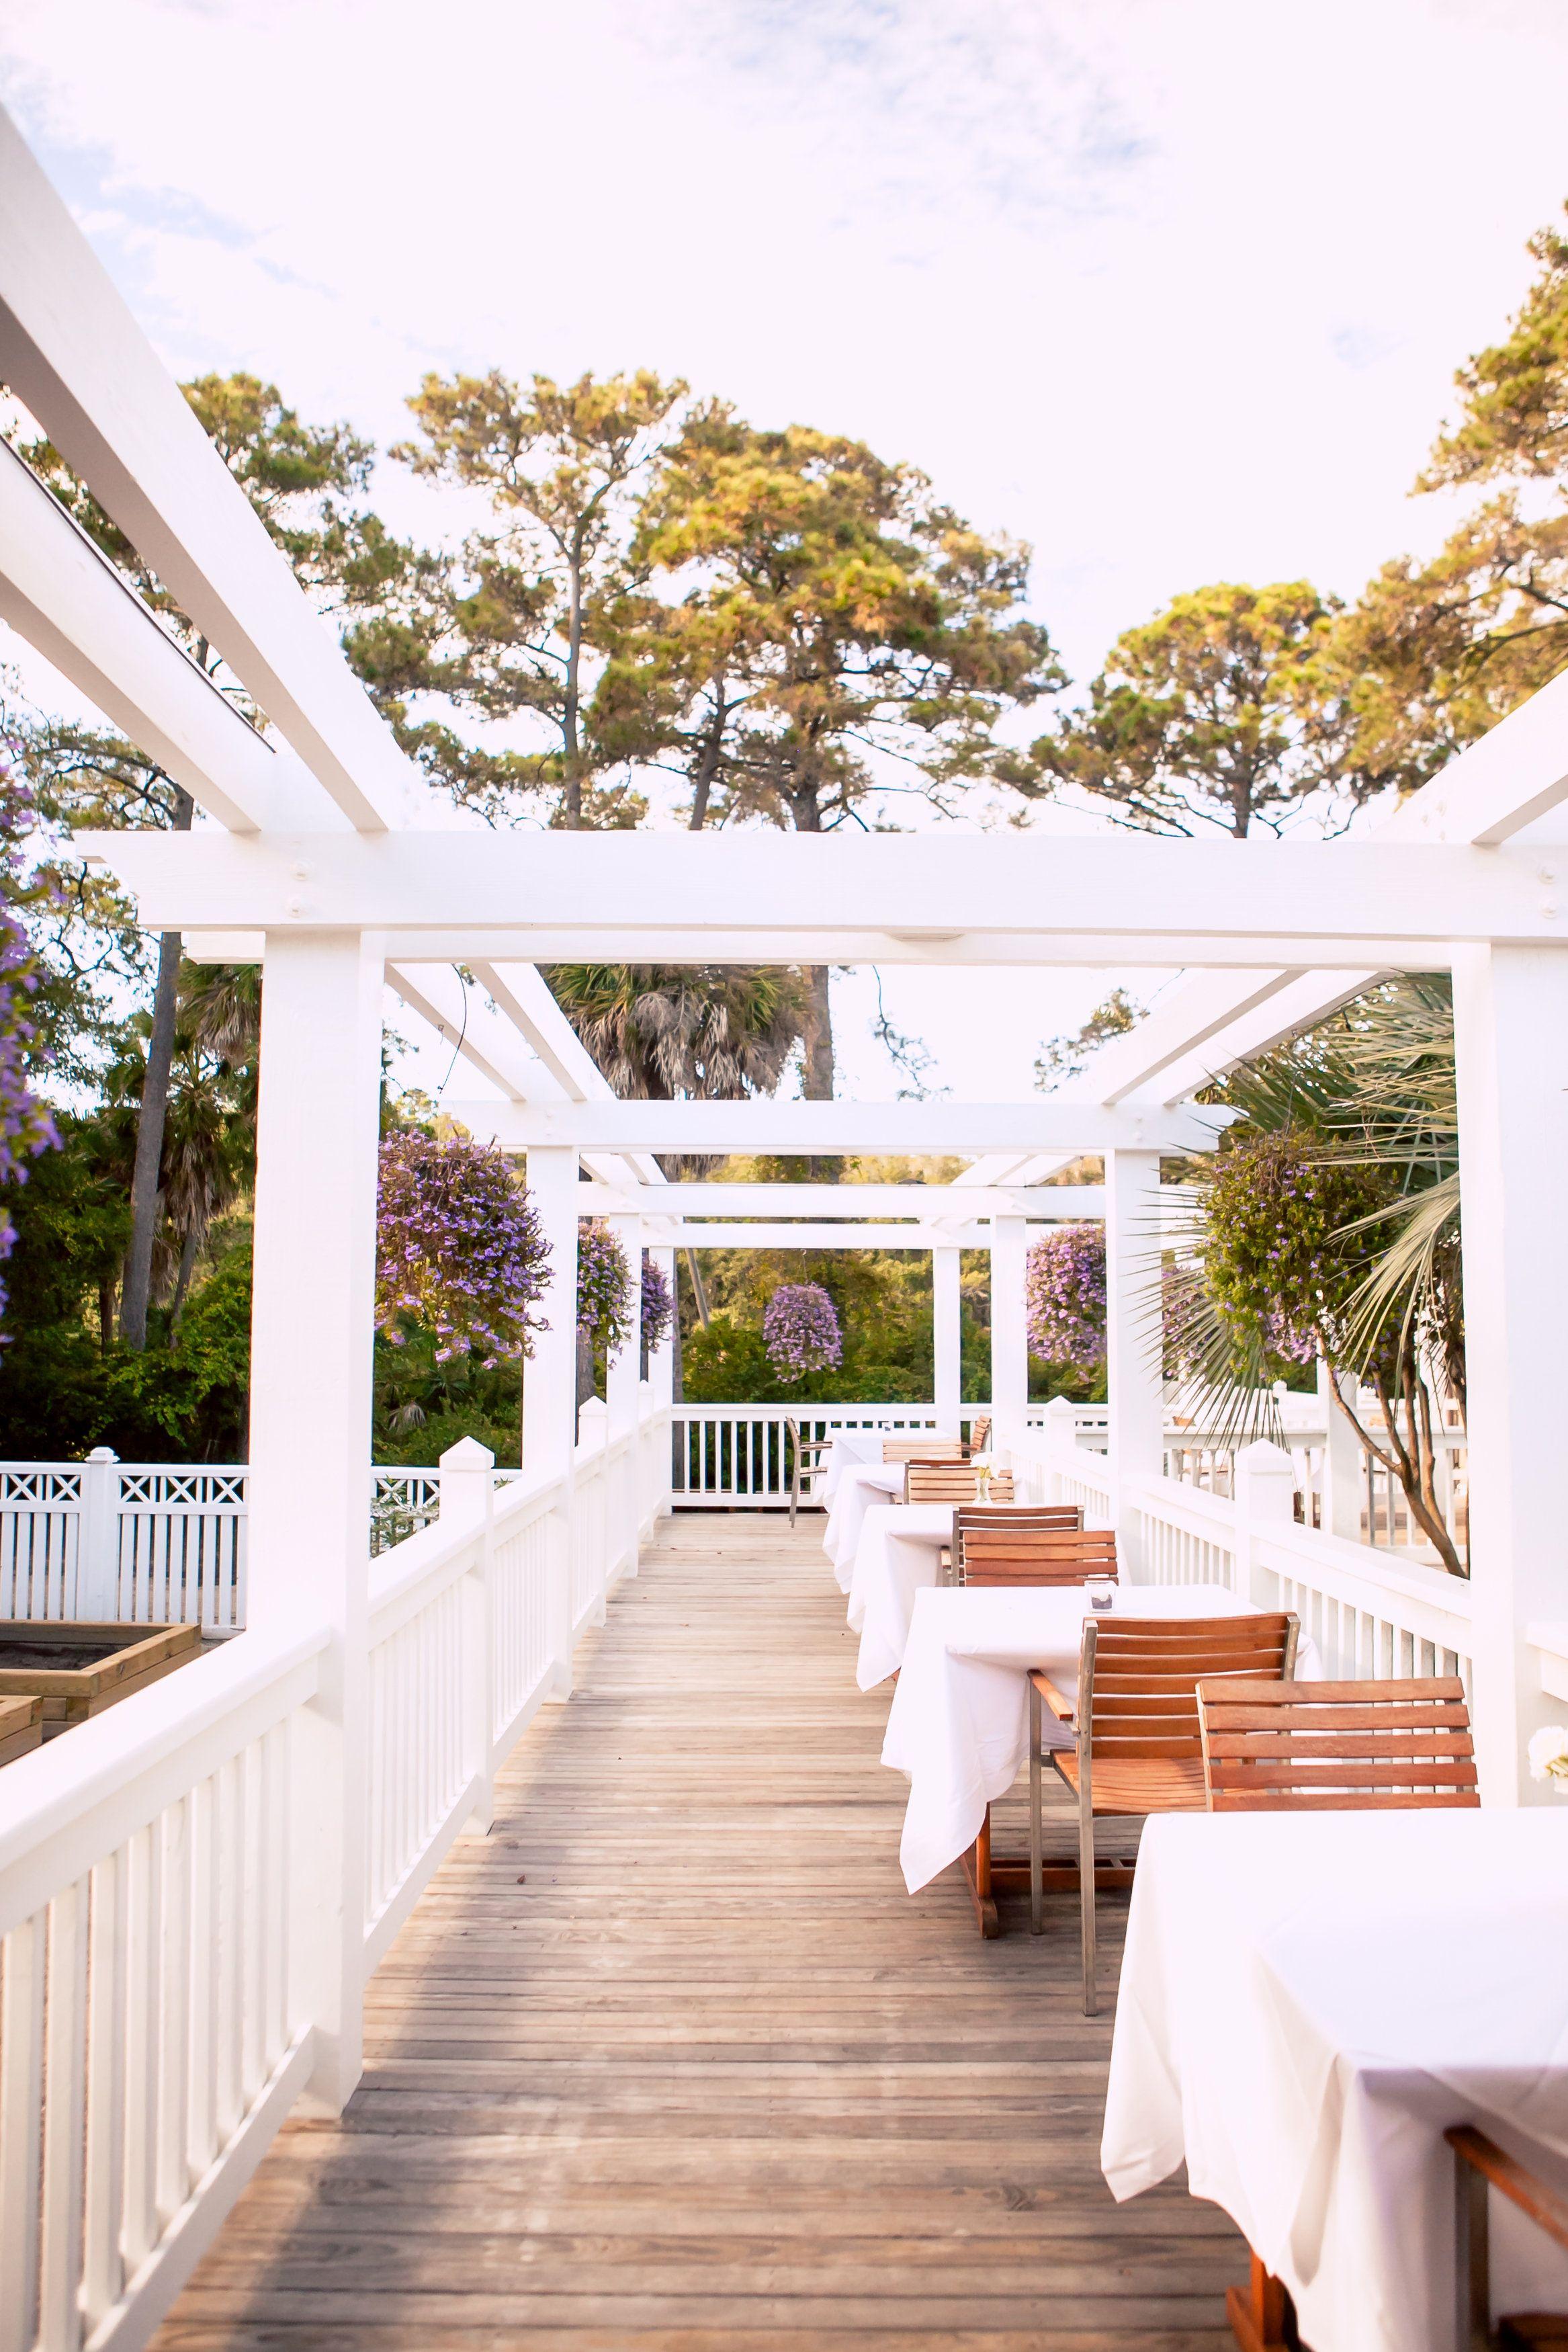 Home | Wedding venues beach, Wedding venues